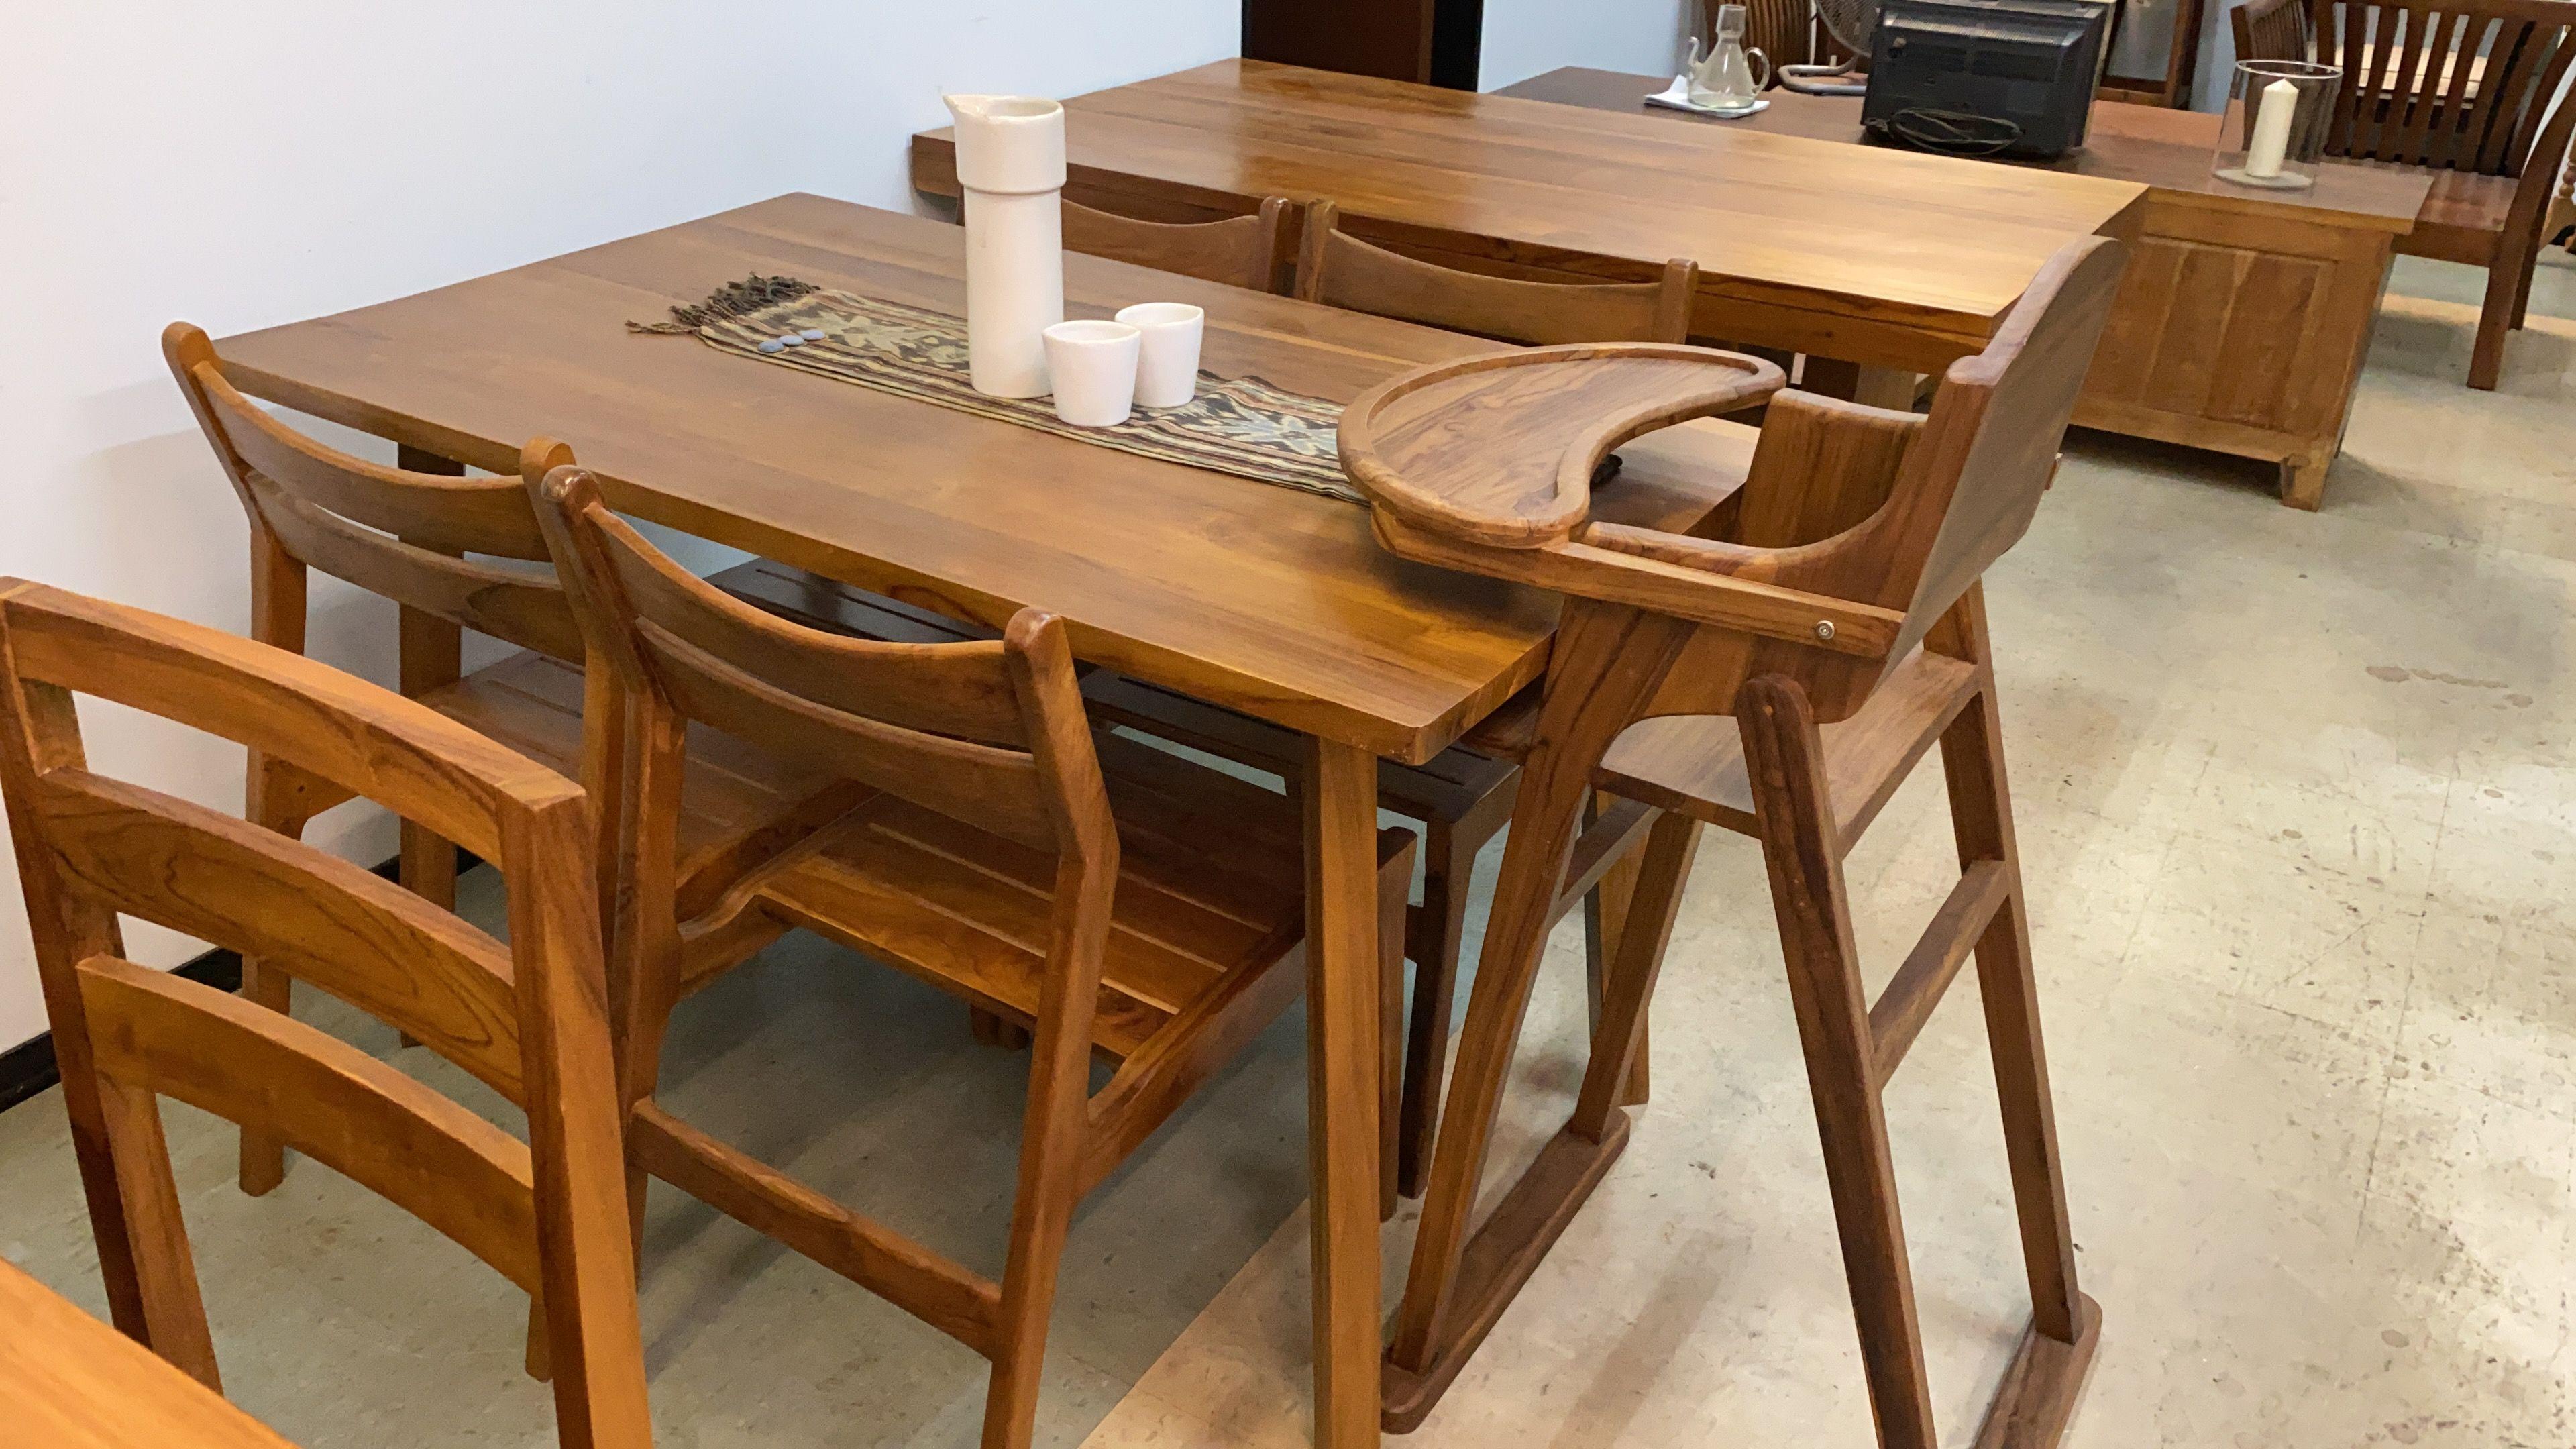 Teak Dining Table Q30 X 80 Cm In 2020 Dining Table Teak Dining